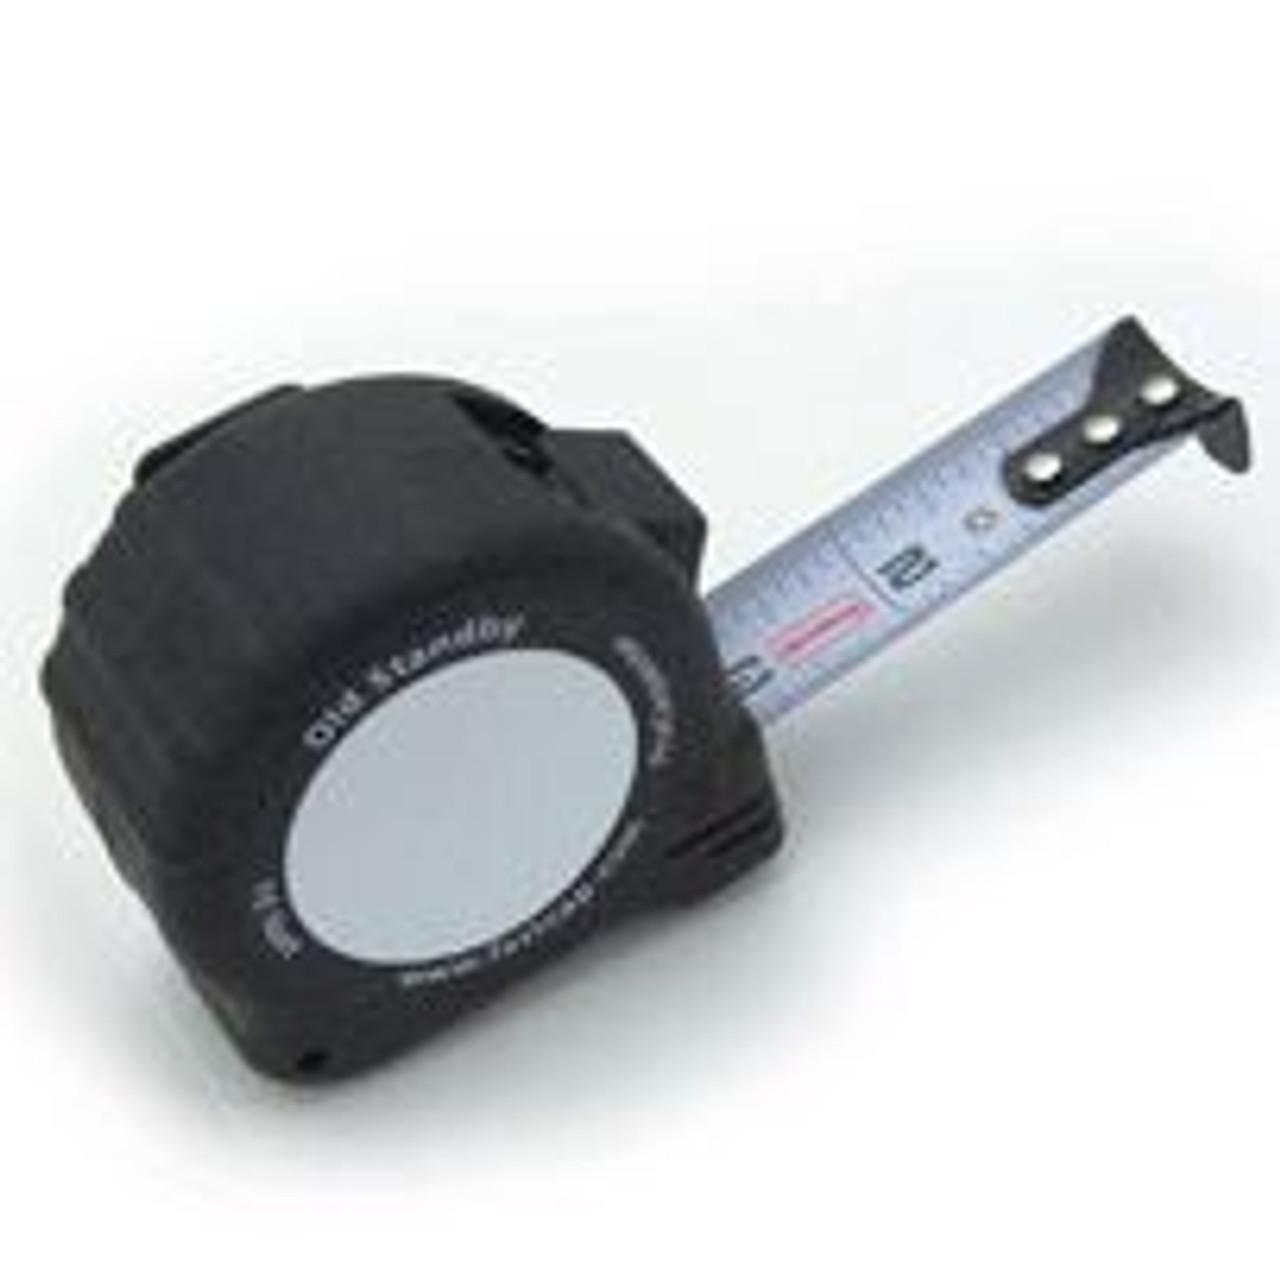 Old Standby Regular Measuring Tape 16 or 25 FT